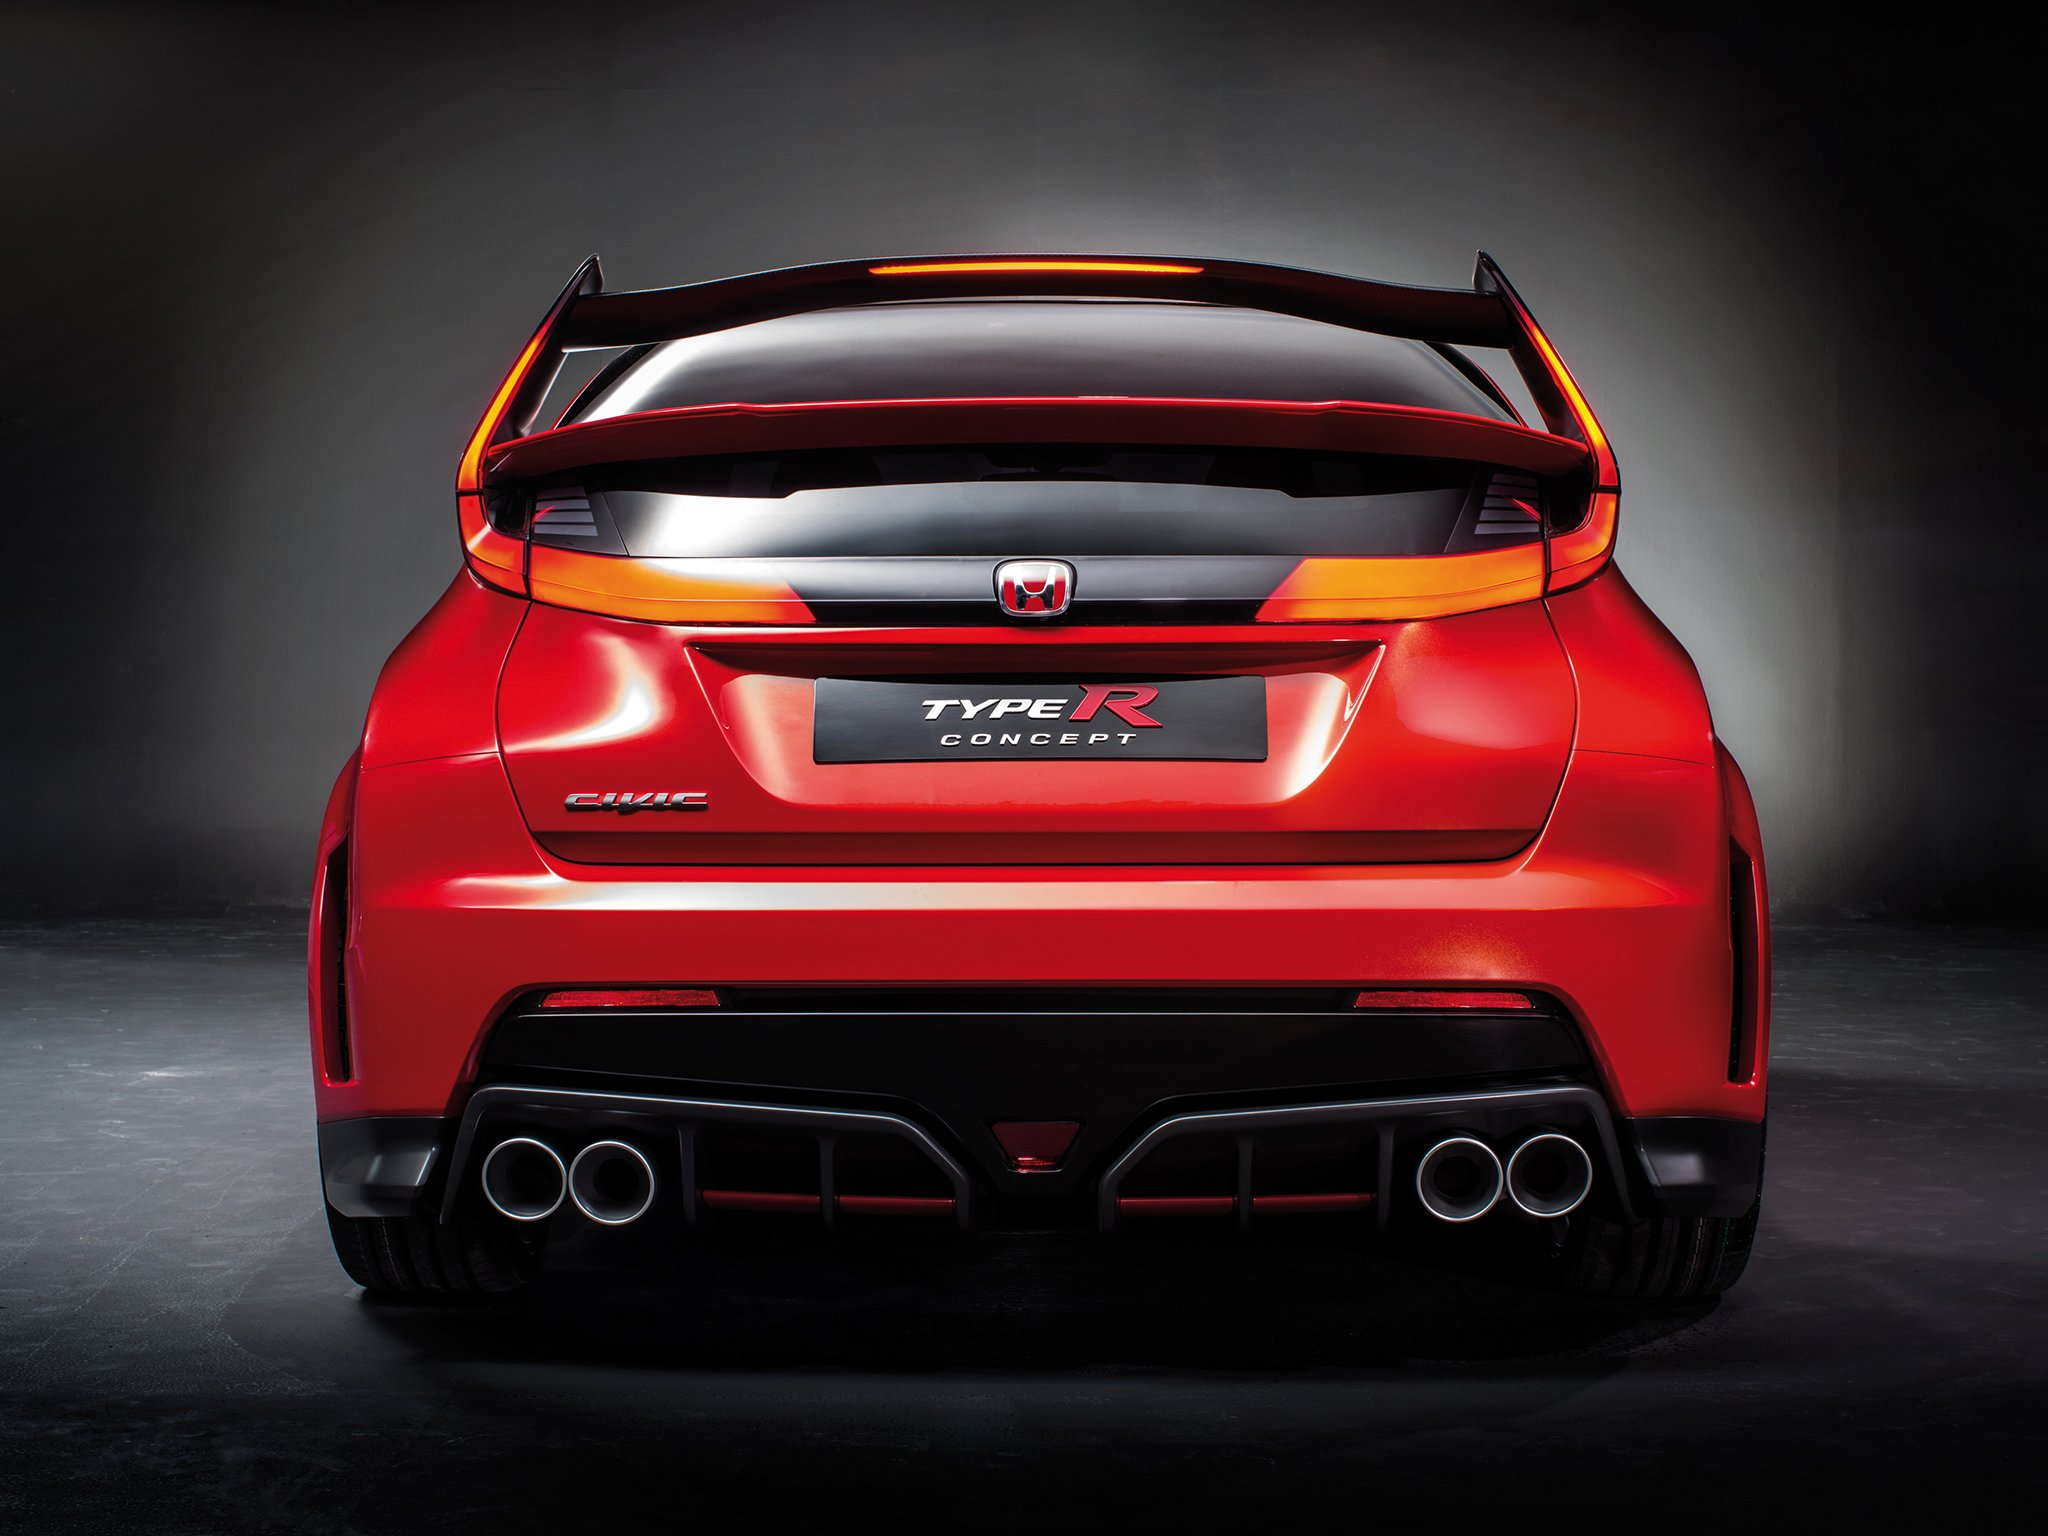 2015 Honda Civic Type-R Concept d wallpaper   2048x1536   287891   WallpaperUP